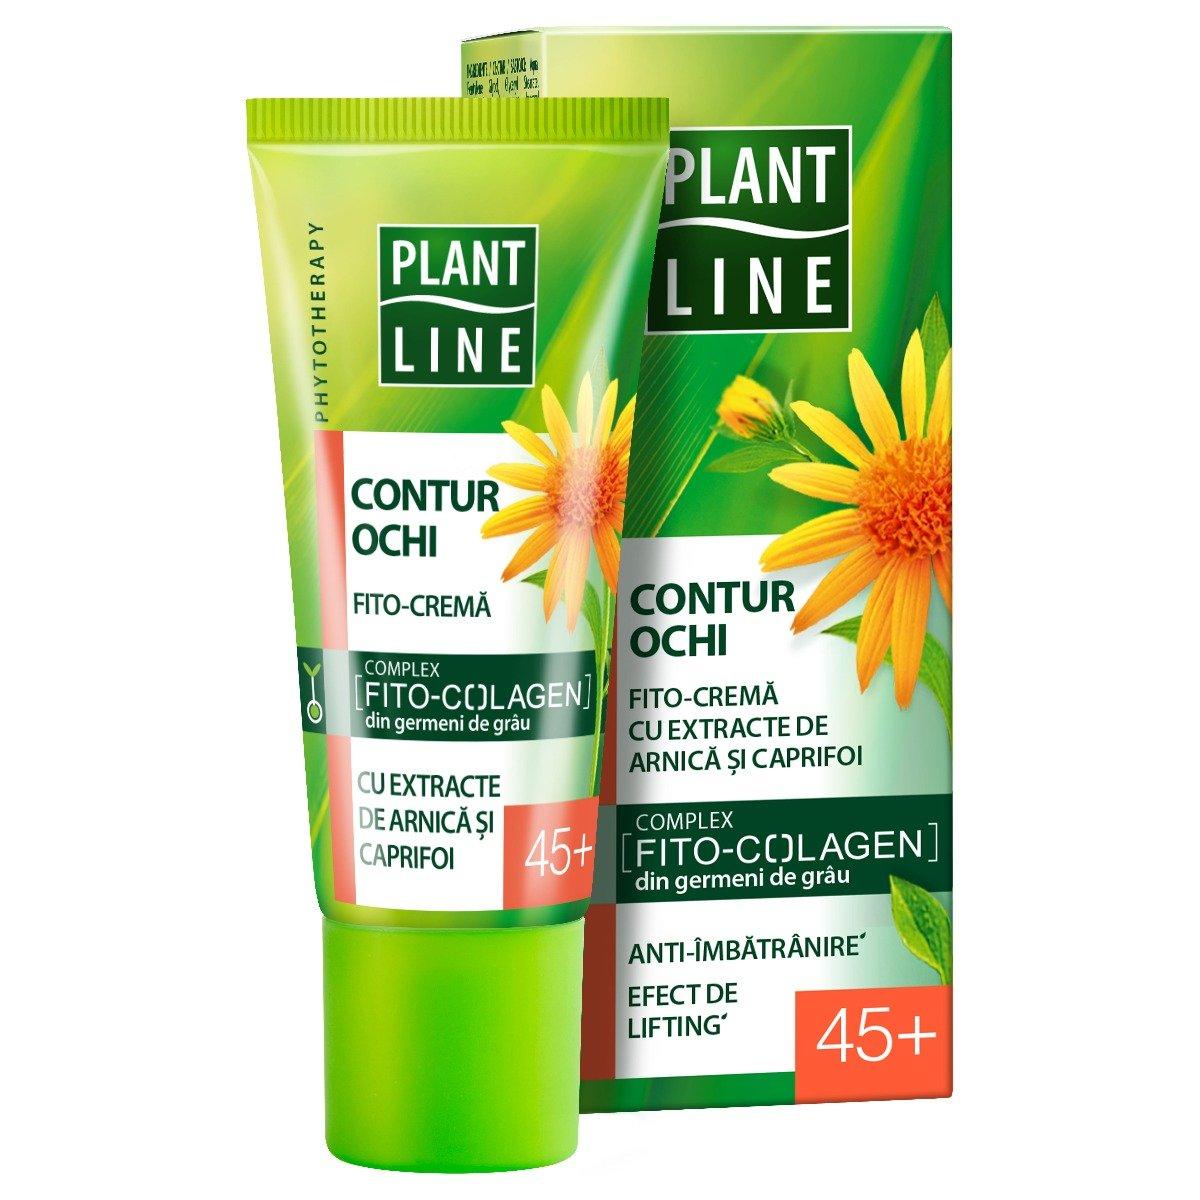 Crema de ochi Plant Line Arnica, 45+, 20 ml imagine